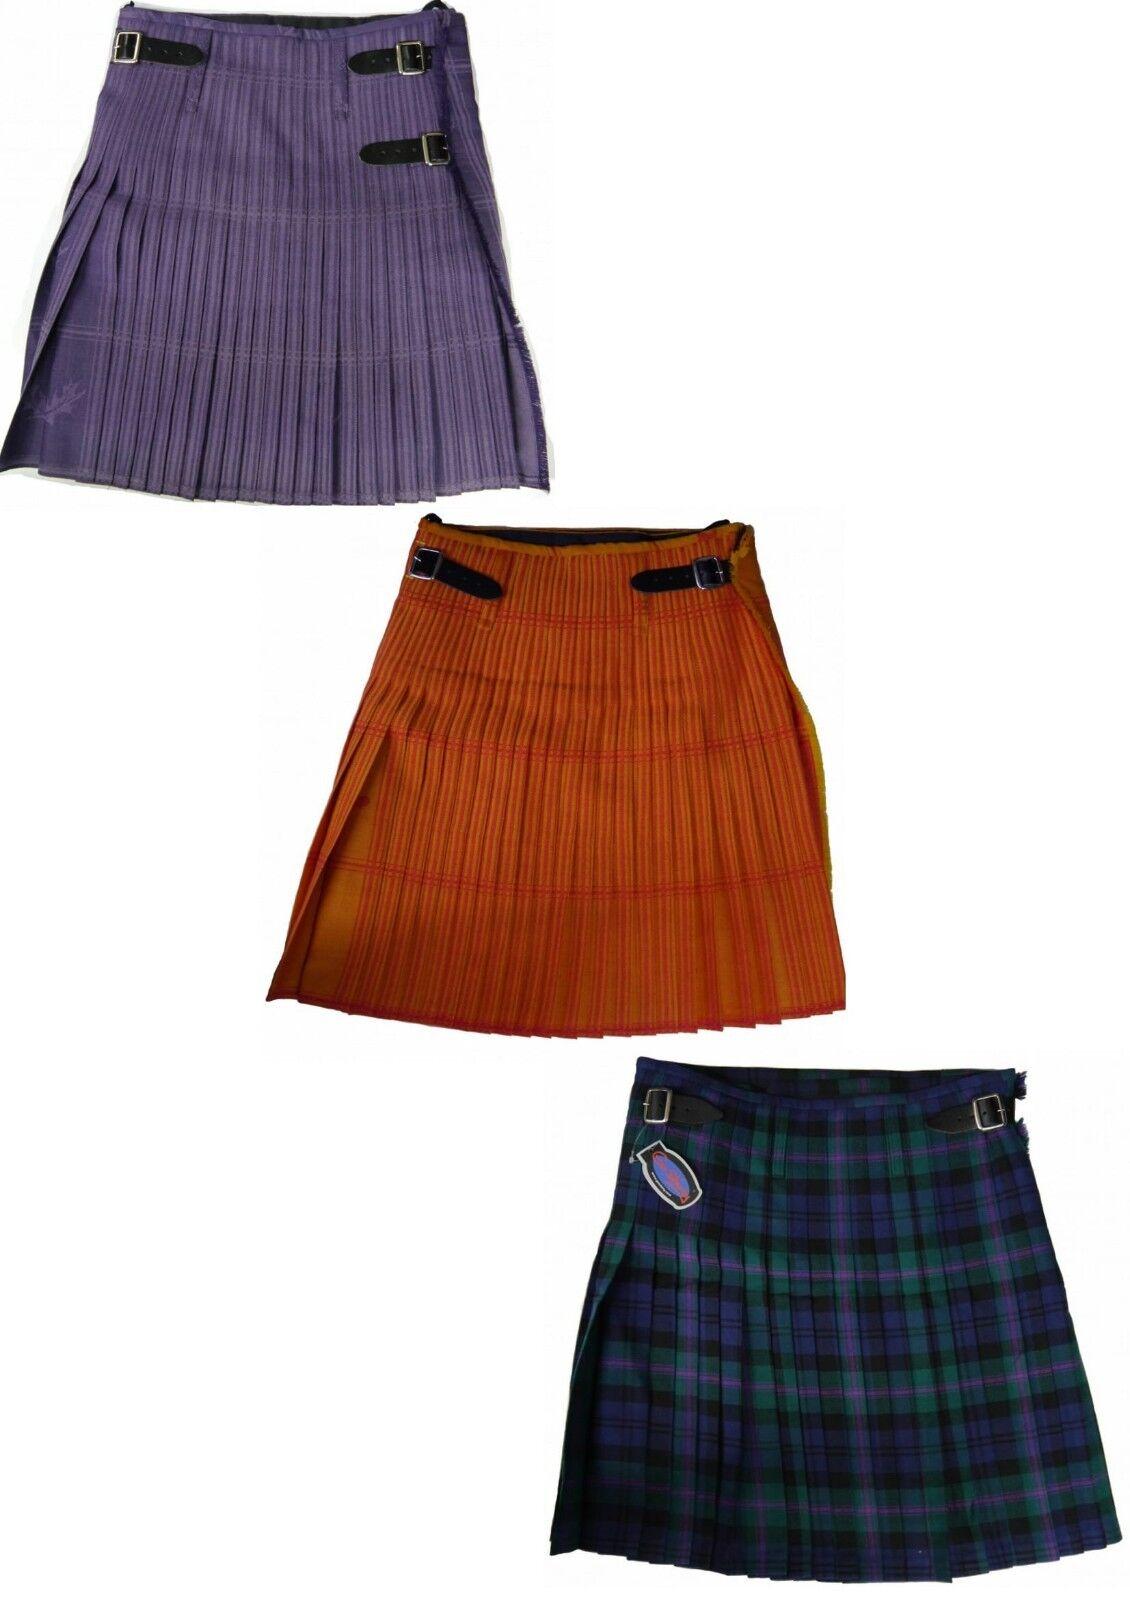 Mens Scottish Kilt 100% New Wool